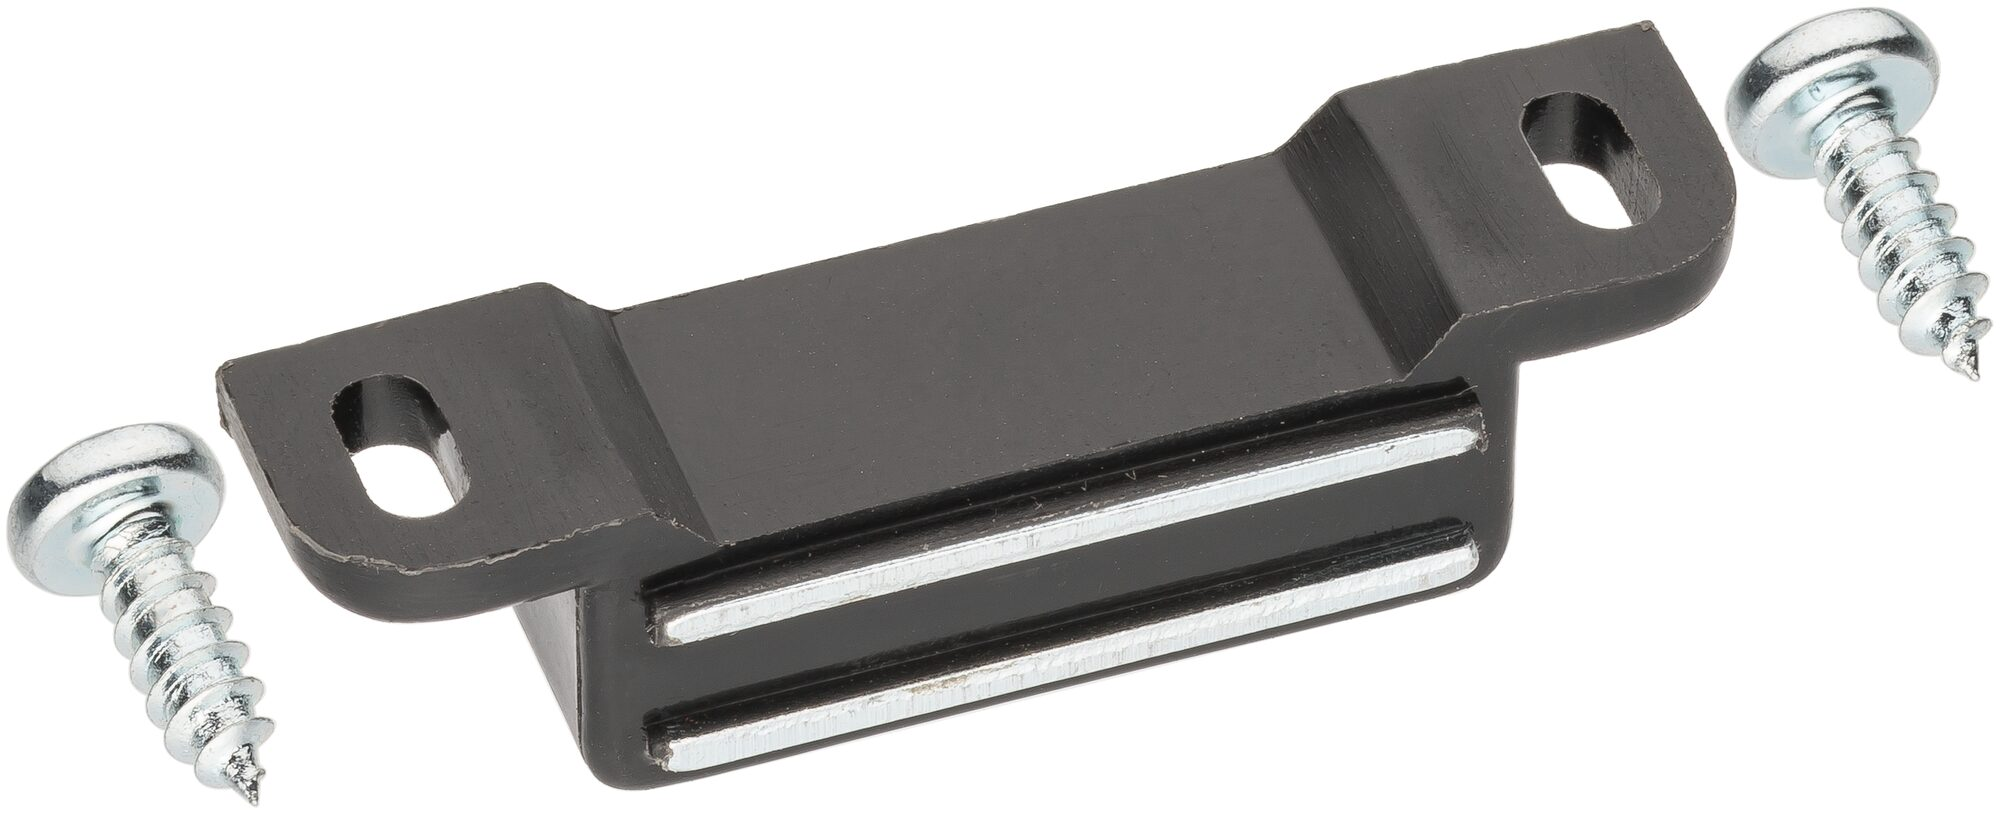 HAZET Magnetschnapper 179NW-012